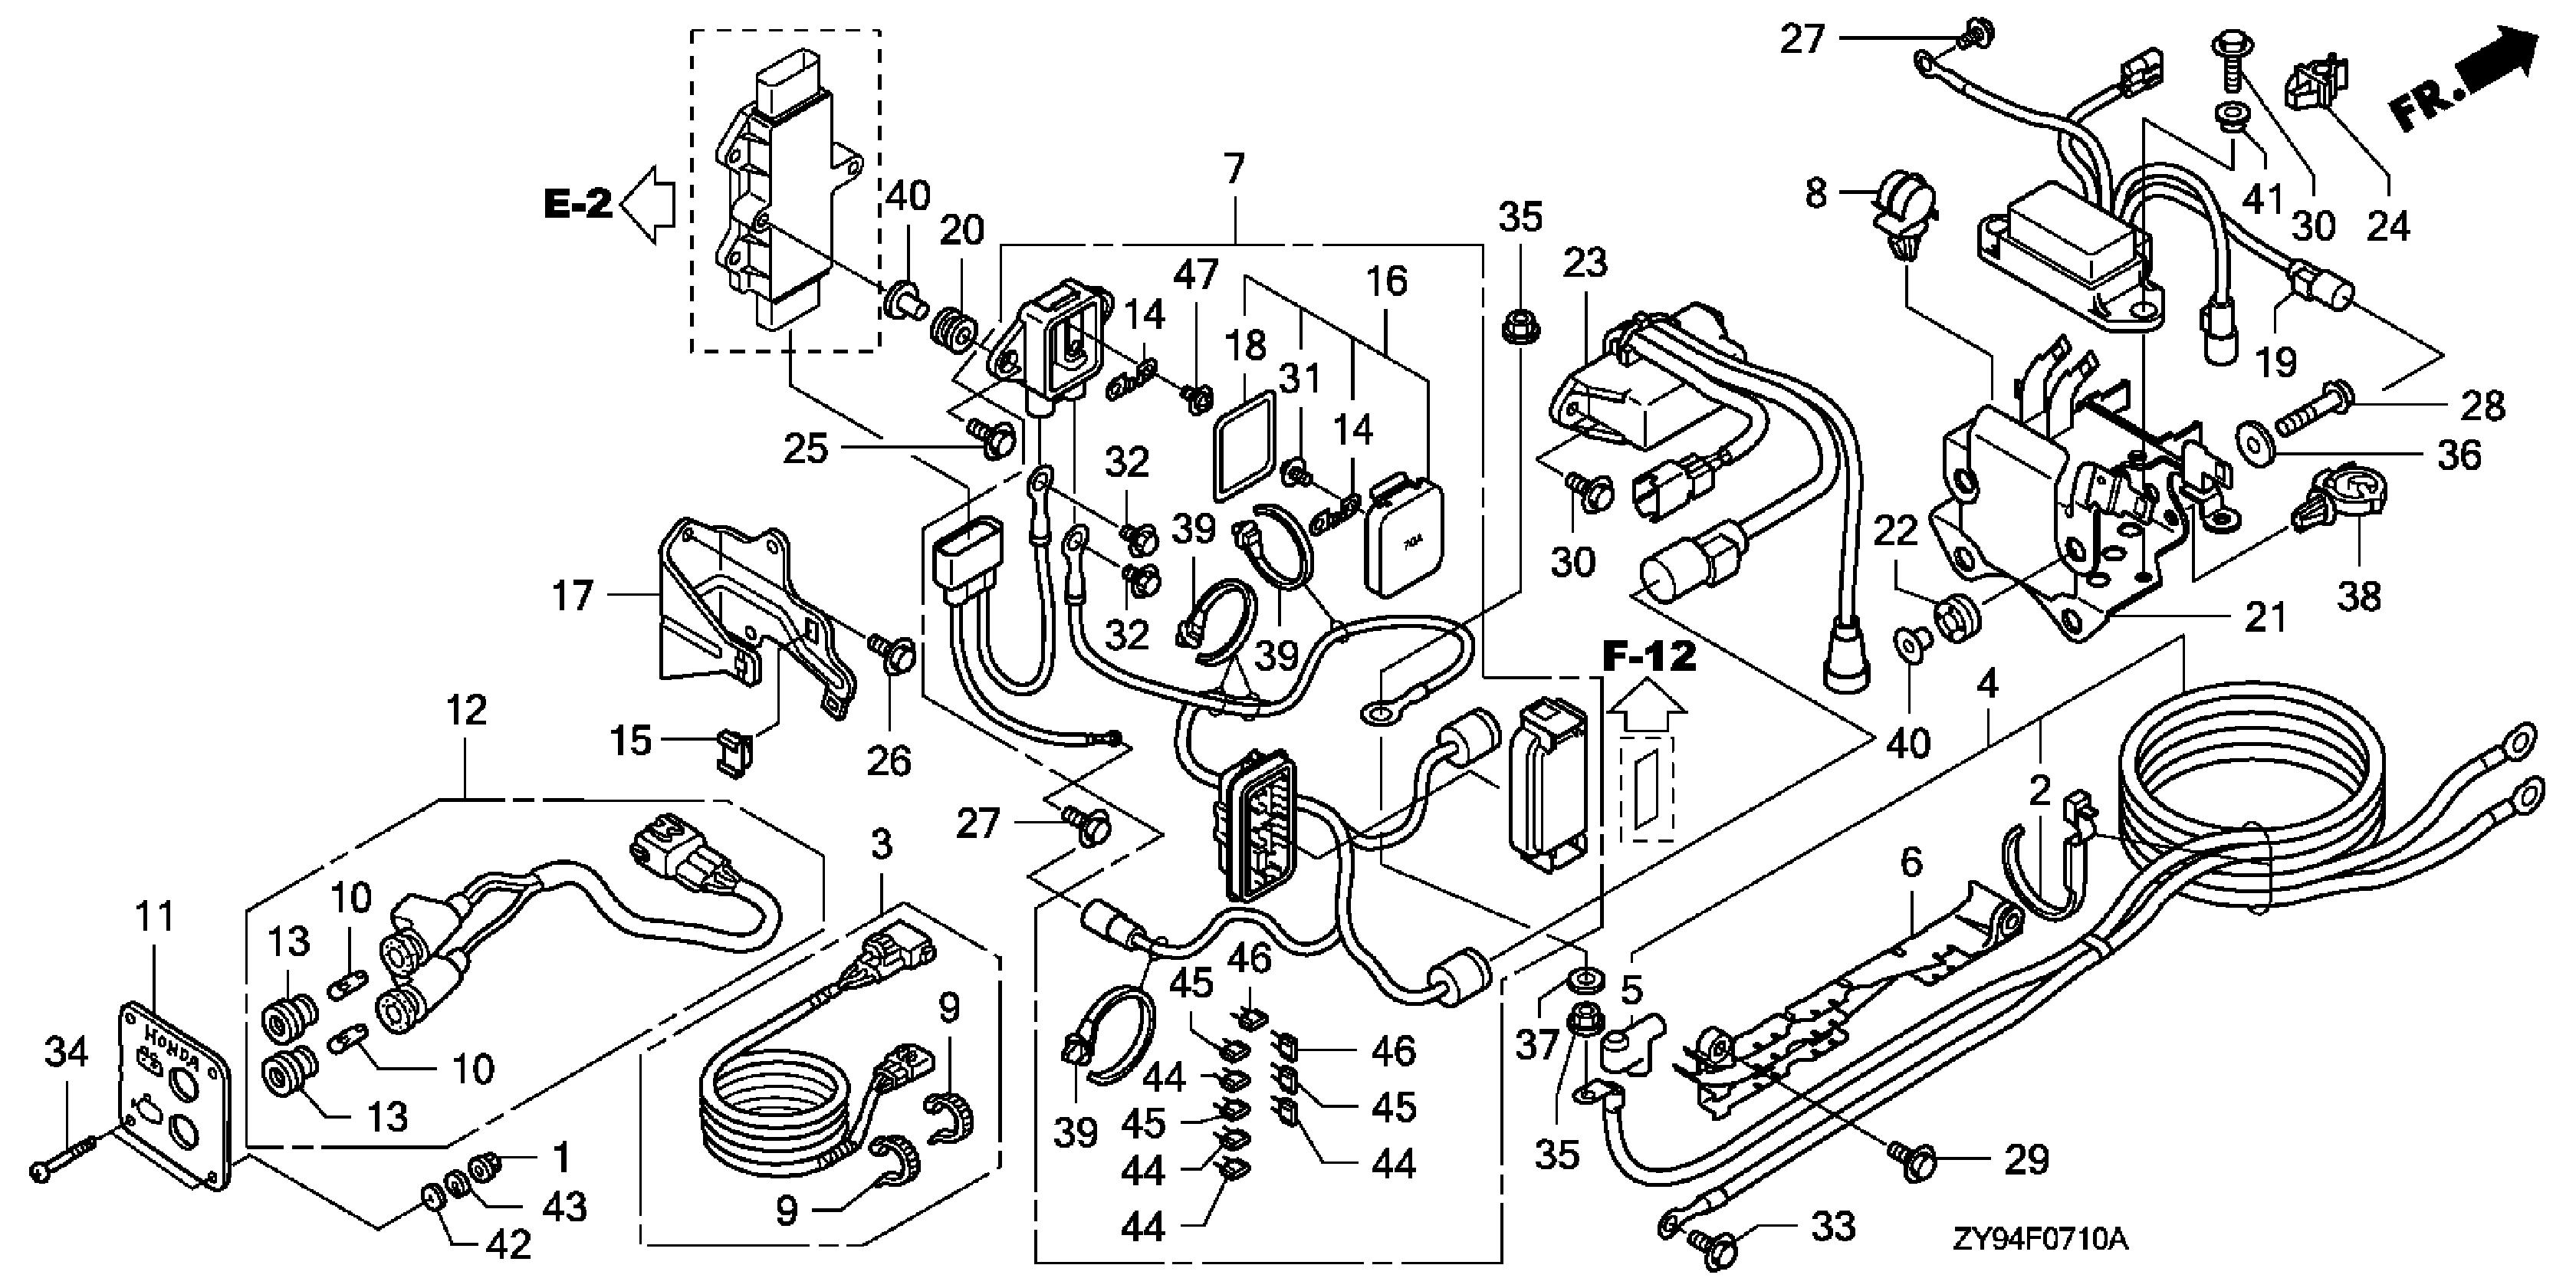 Kioti Ck20 Replacement Parts Photo Trend Ideas Engine Diagram Tractor 1914 Imageresizertoolcom